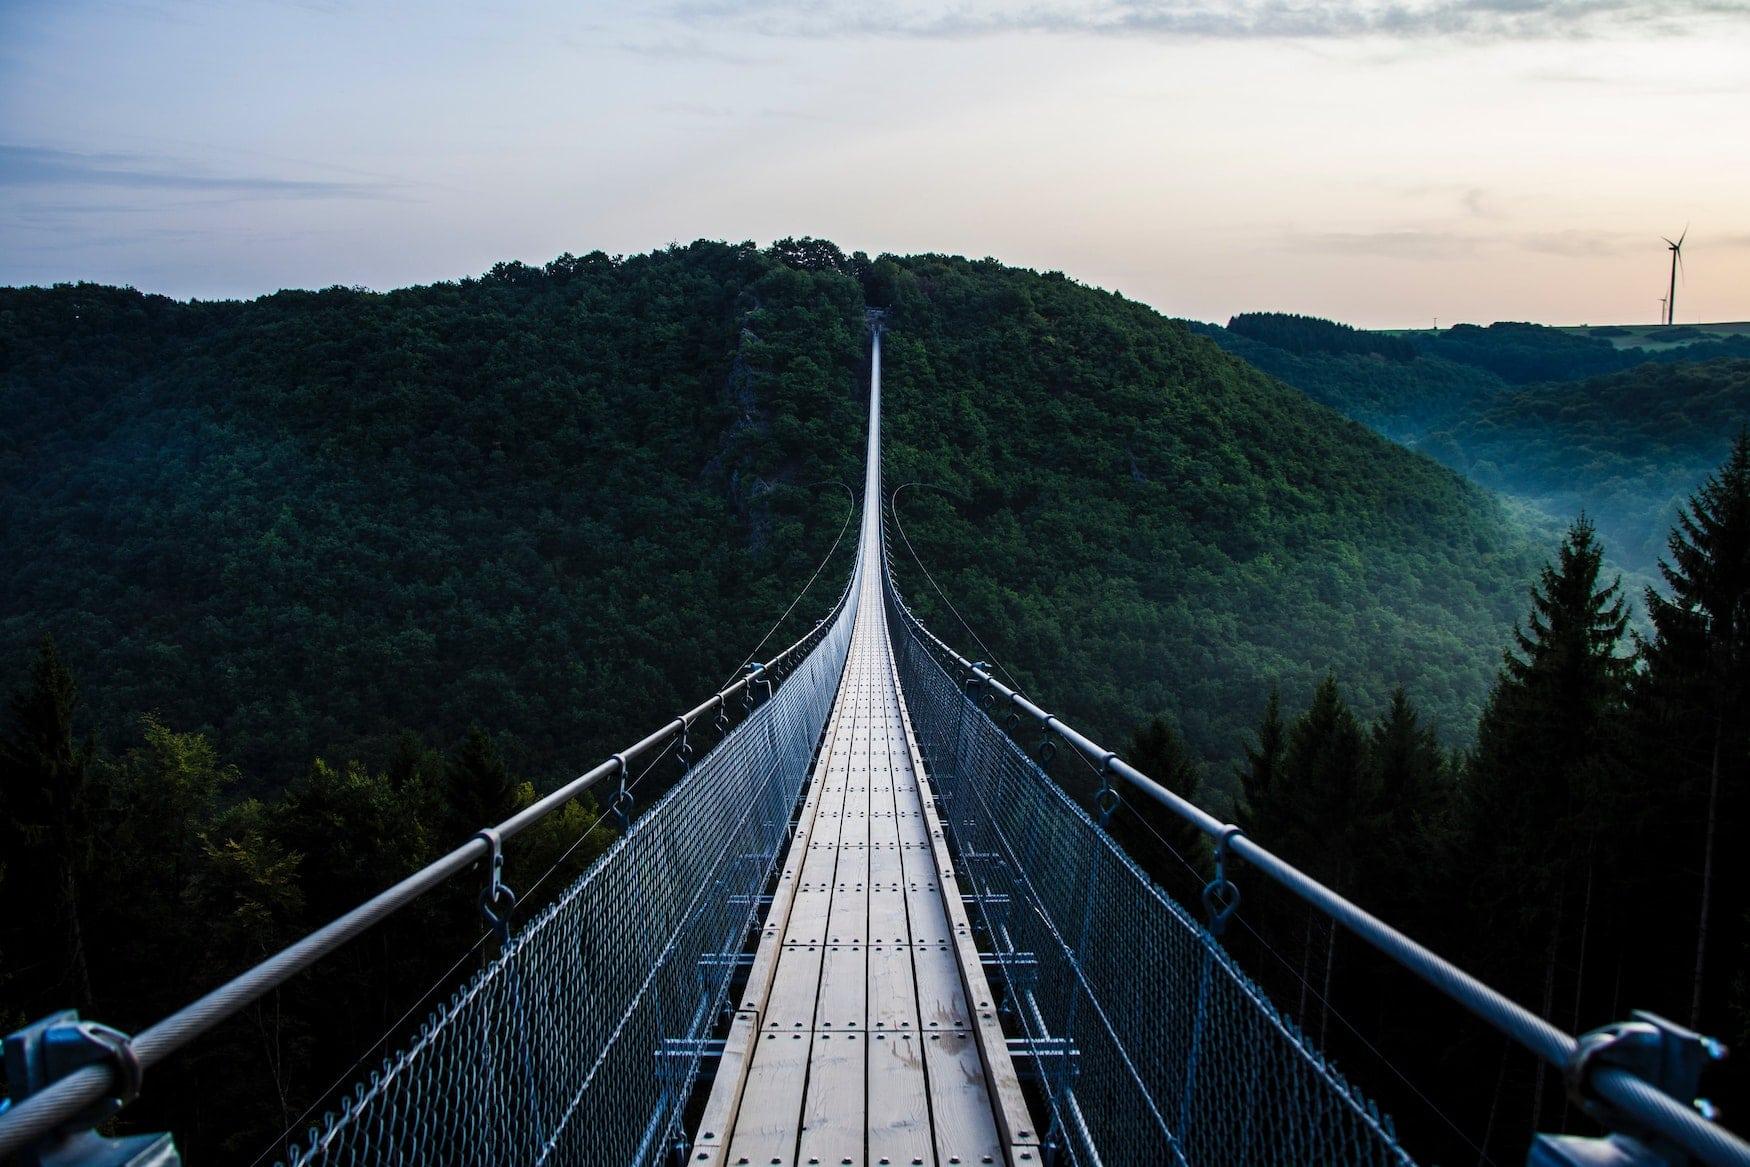 Hängeseilbrücke in Geierlay